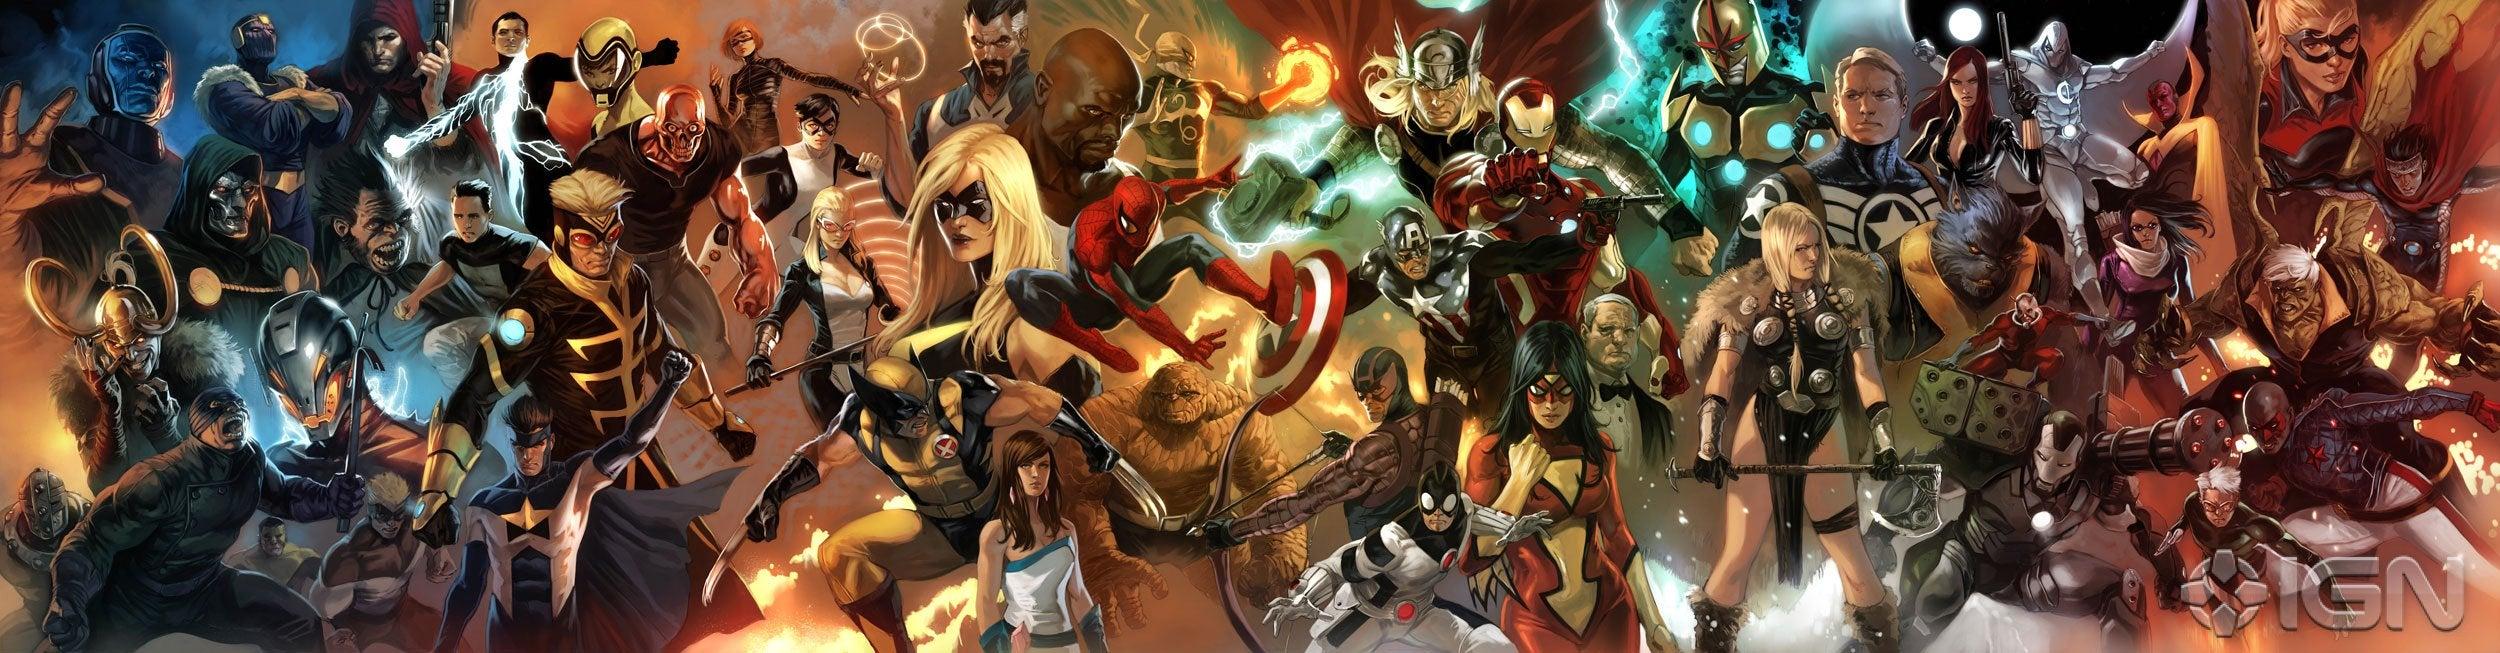 Part 14 / 10 - Page 2 C2e2-10-presenting-marvels-avengers-franchise-20100418005332296